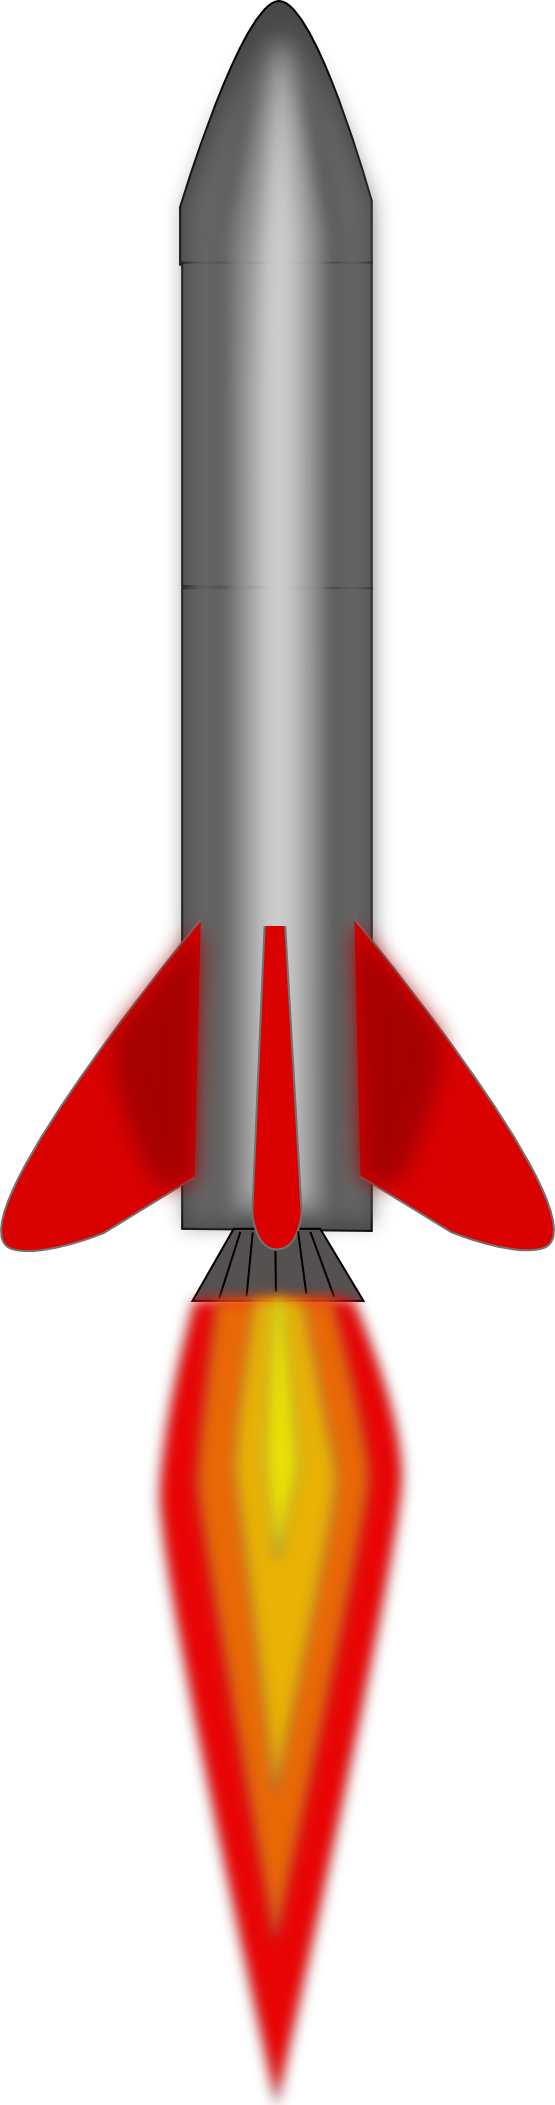 Missile clipart Missile Clip Art Free Missile